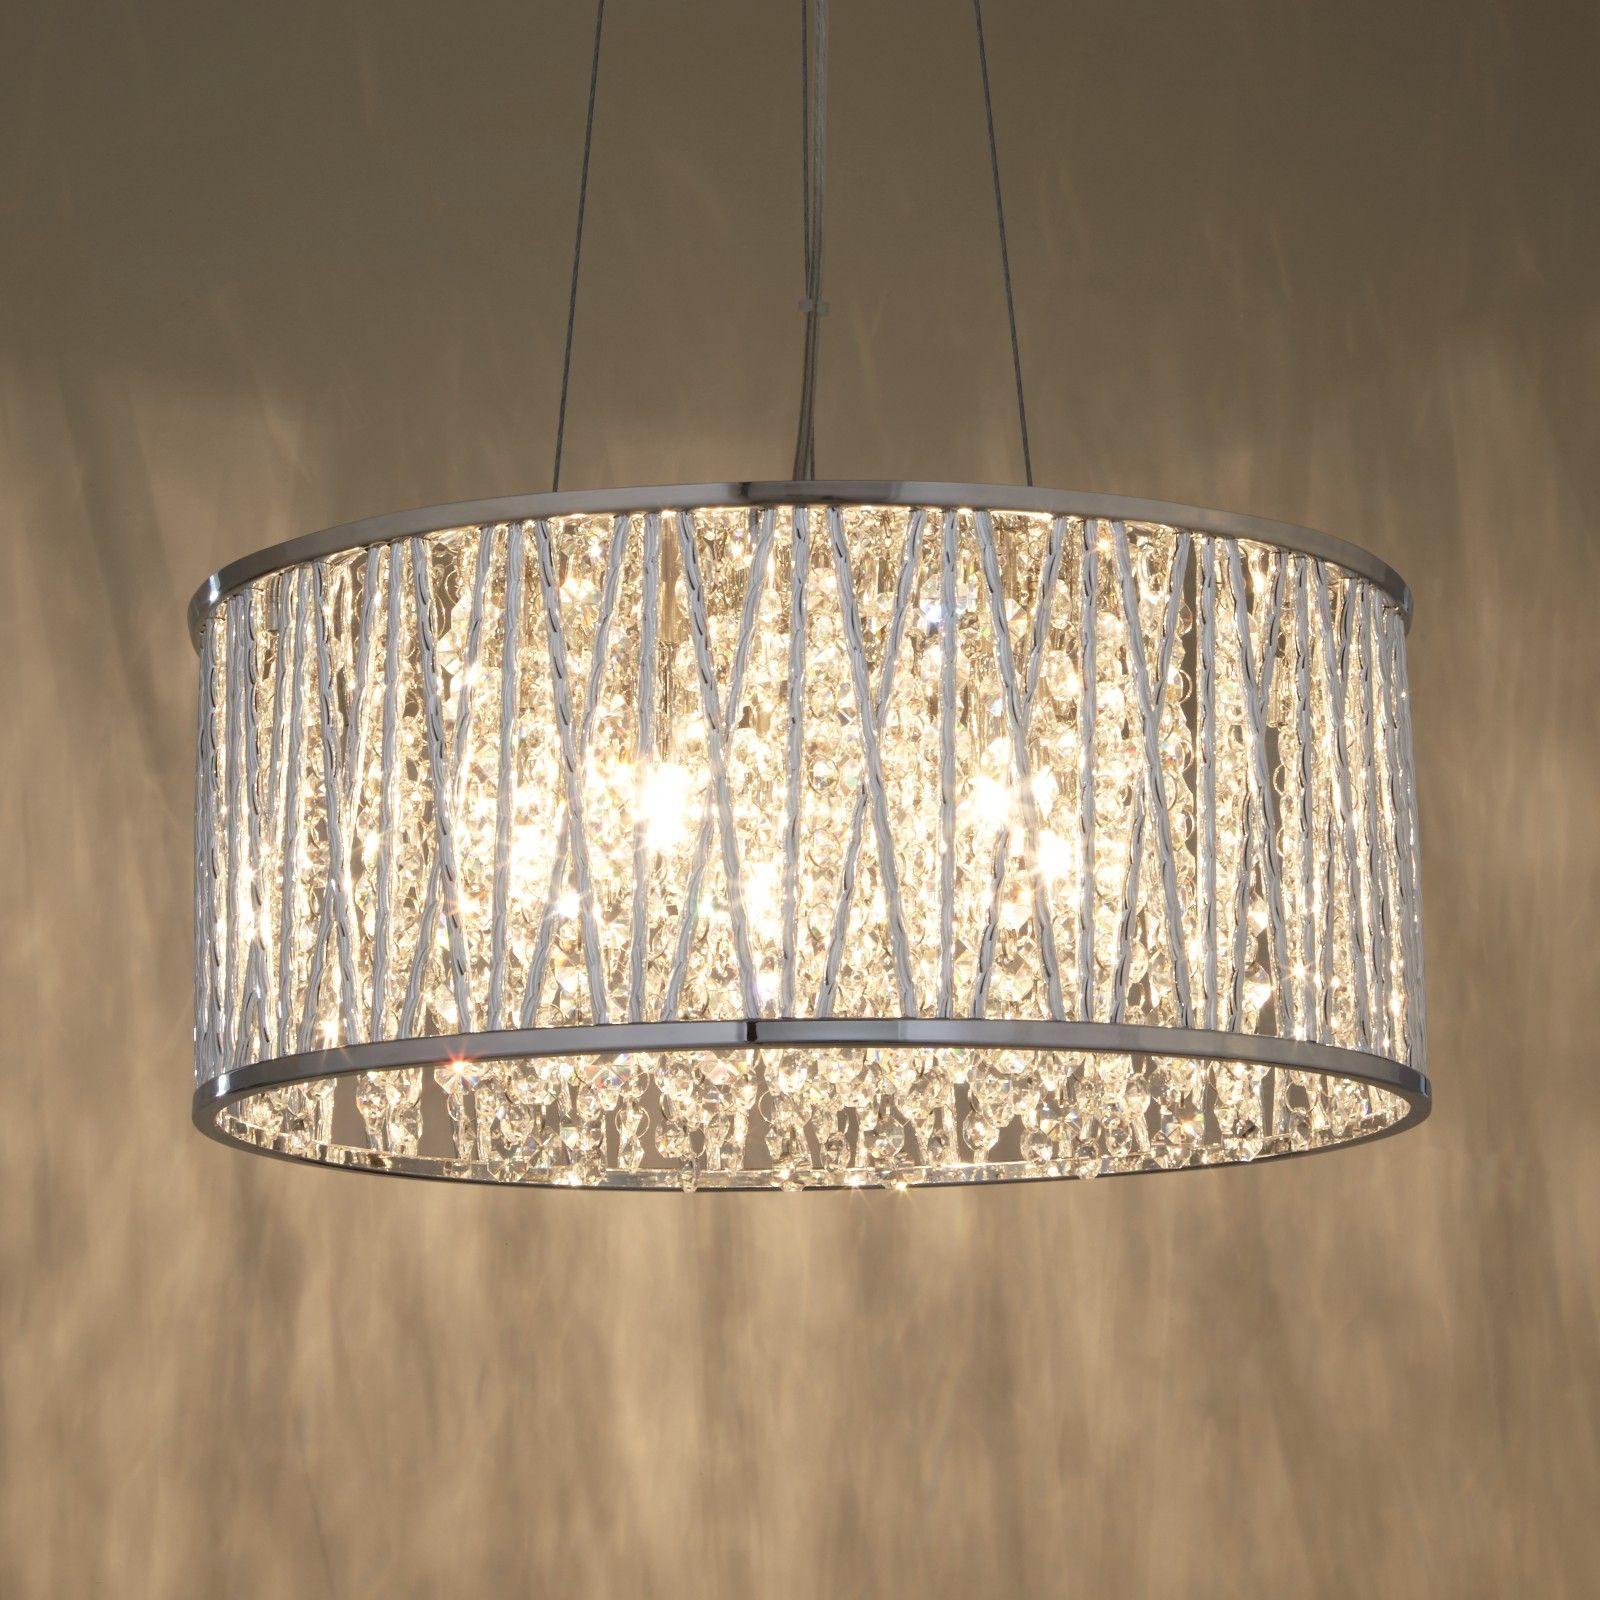 Exclusive Photo Of Large Drum Chandelier Interior Design Ideas Home Decorating Inspiration Moercar Crystal Ceiling Light Bedroom Ceiling Light Crystal Pendant Lighting